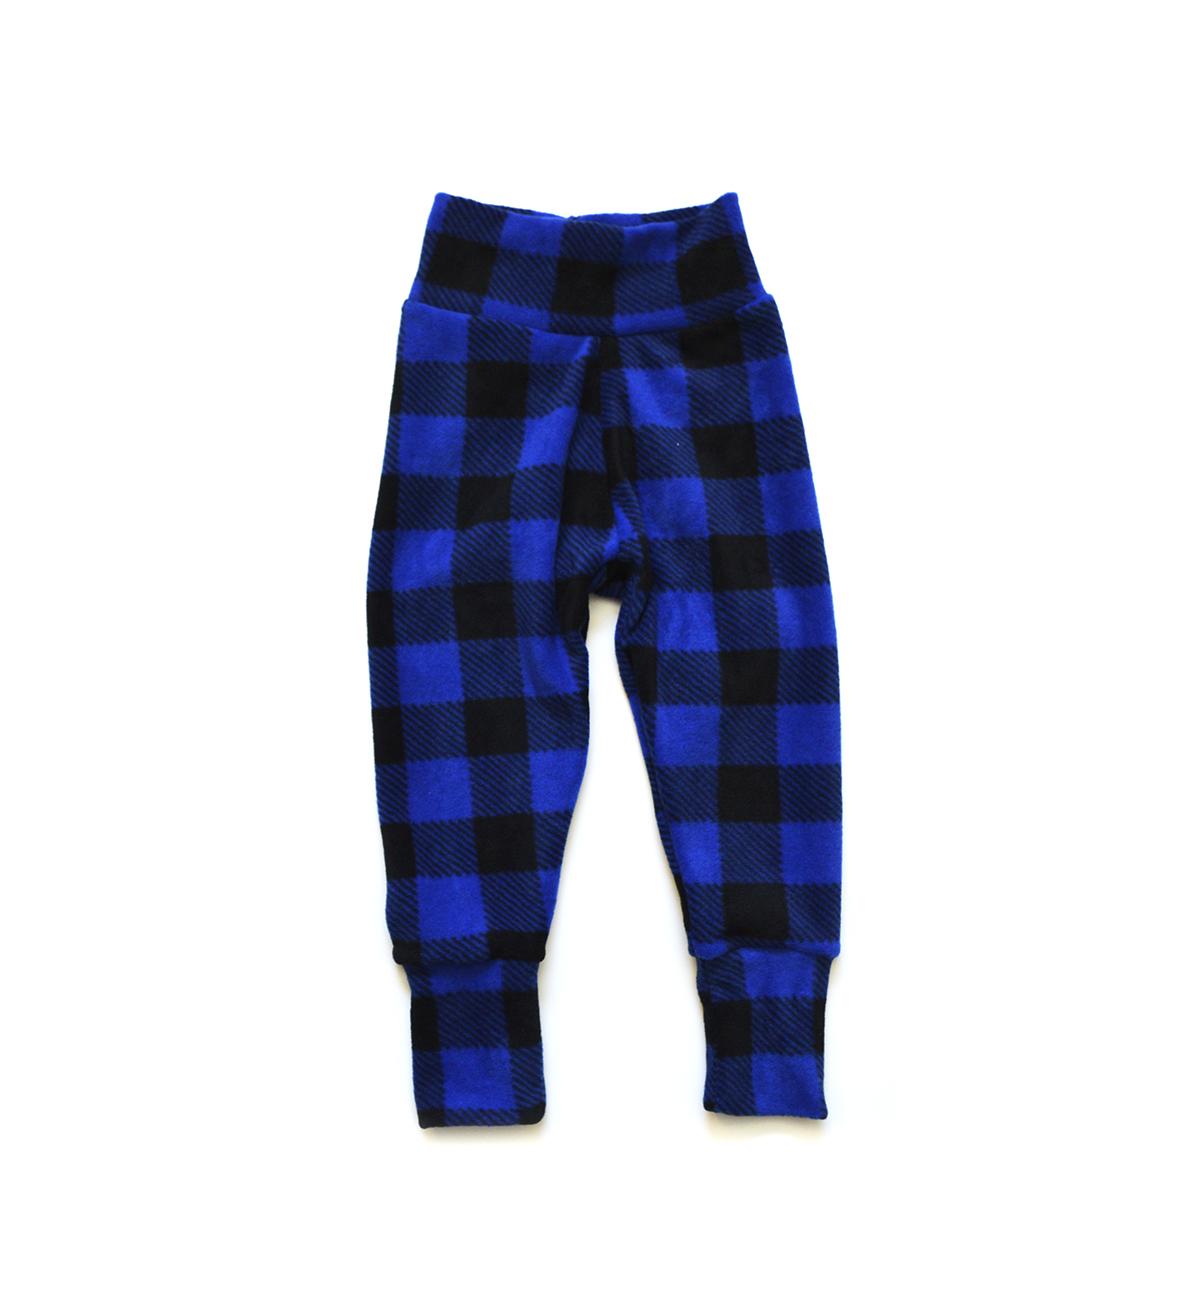 Little Sprout Pants™ Blue Buffalo Plaid - Fleece 00516